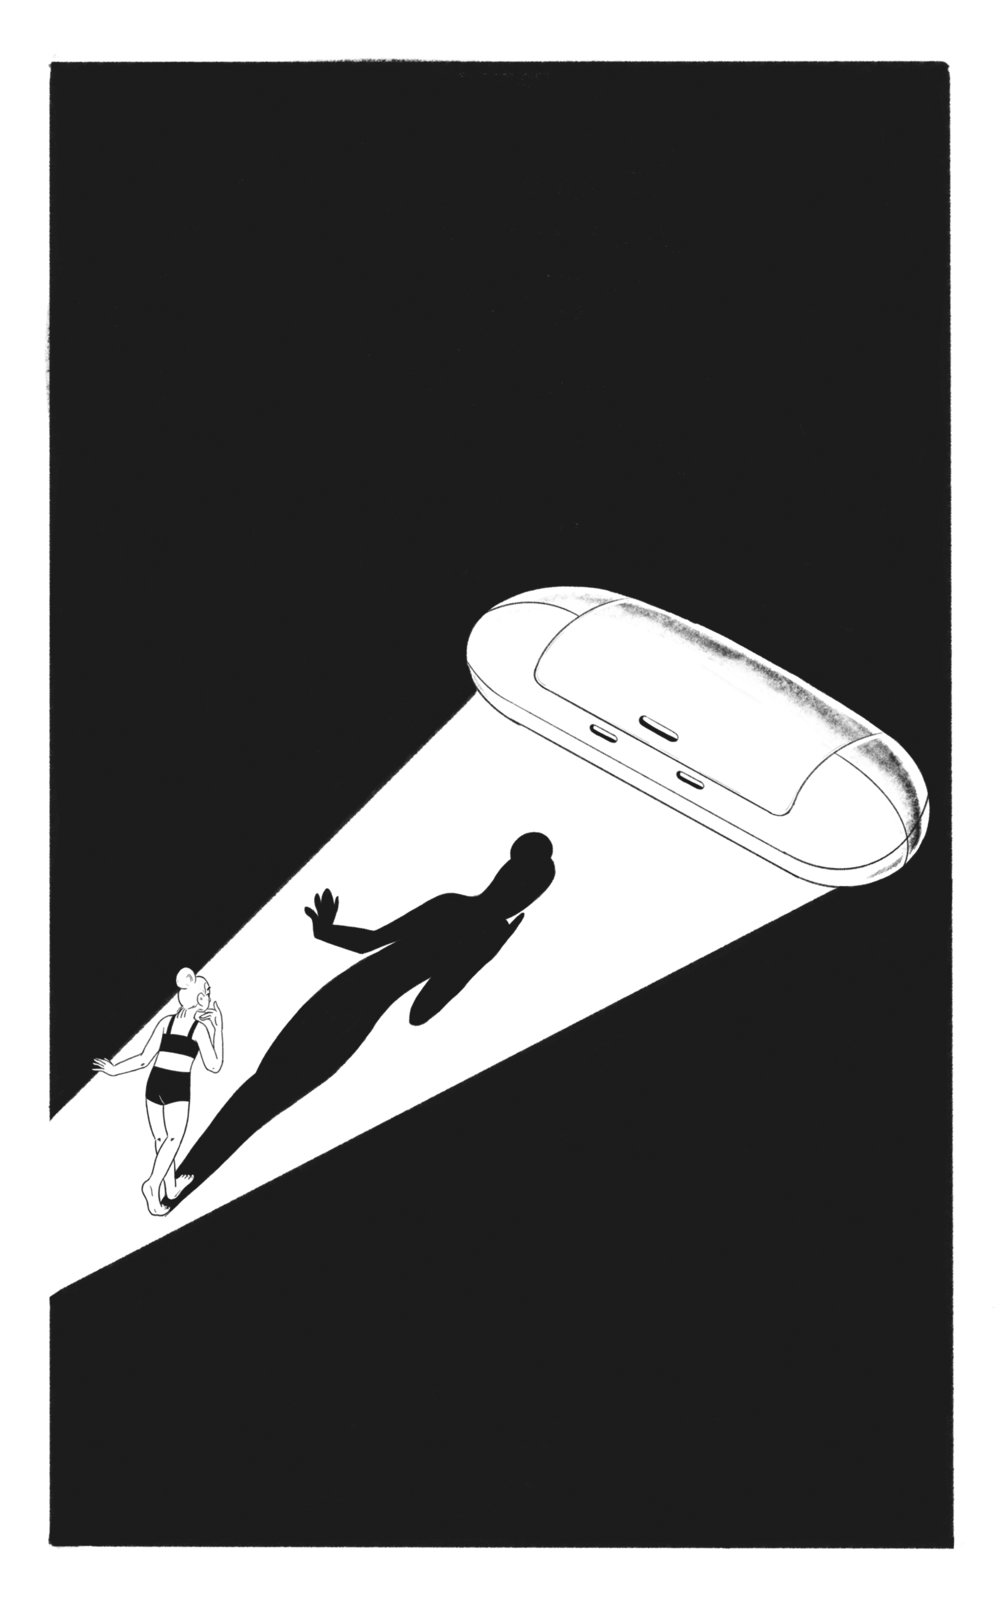 'Float Land' (a short story by Nicole Boyce), 2018.